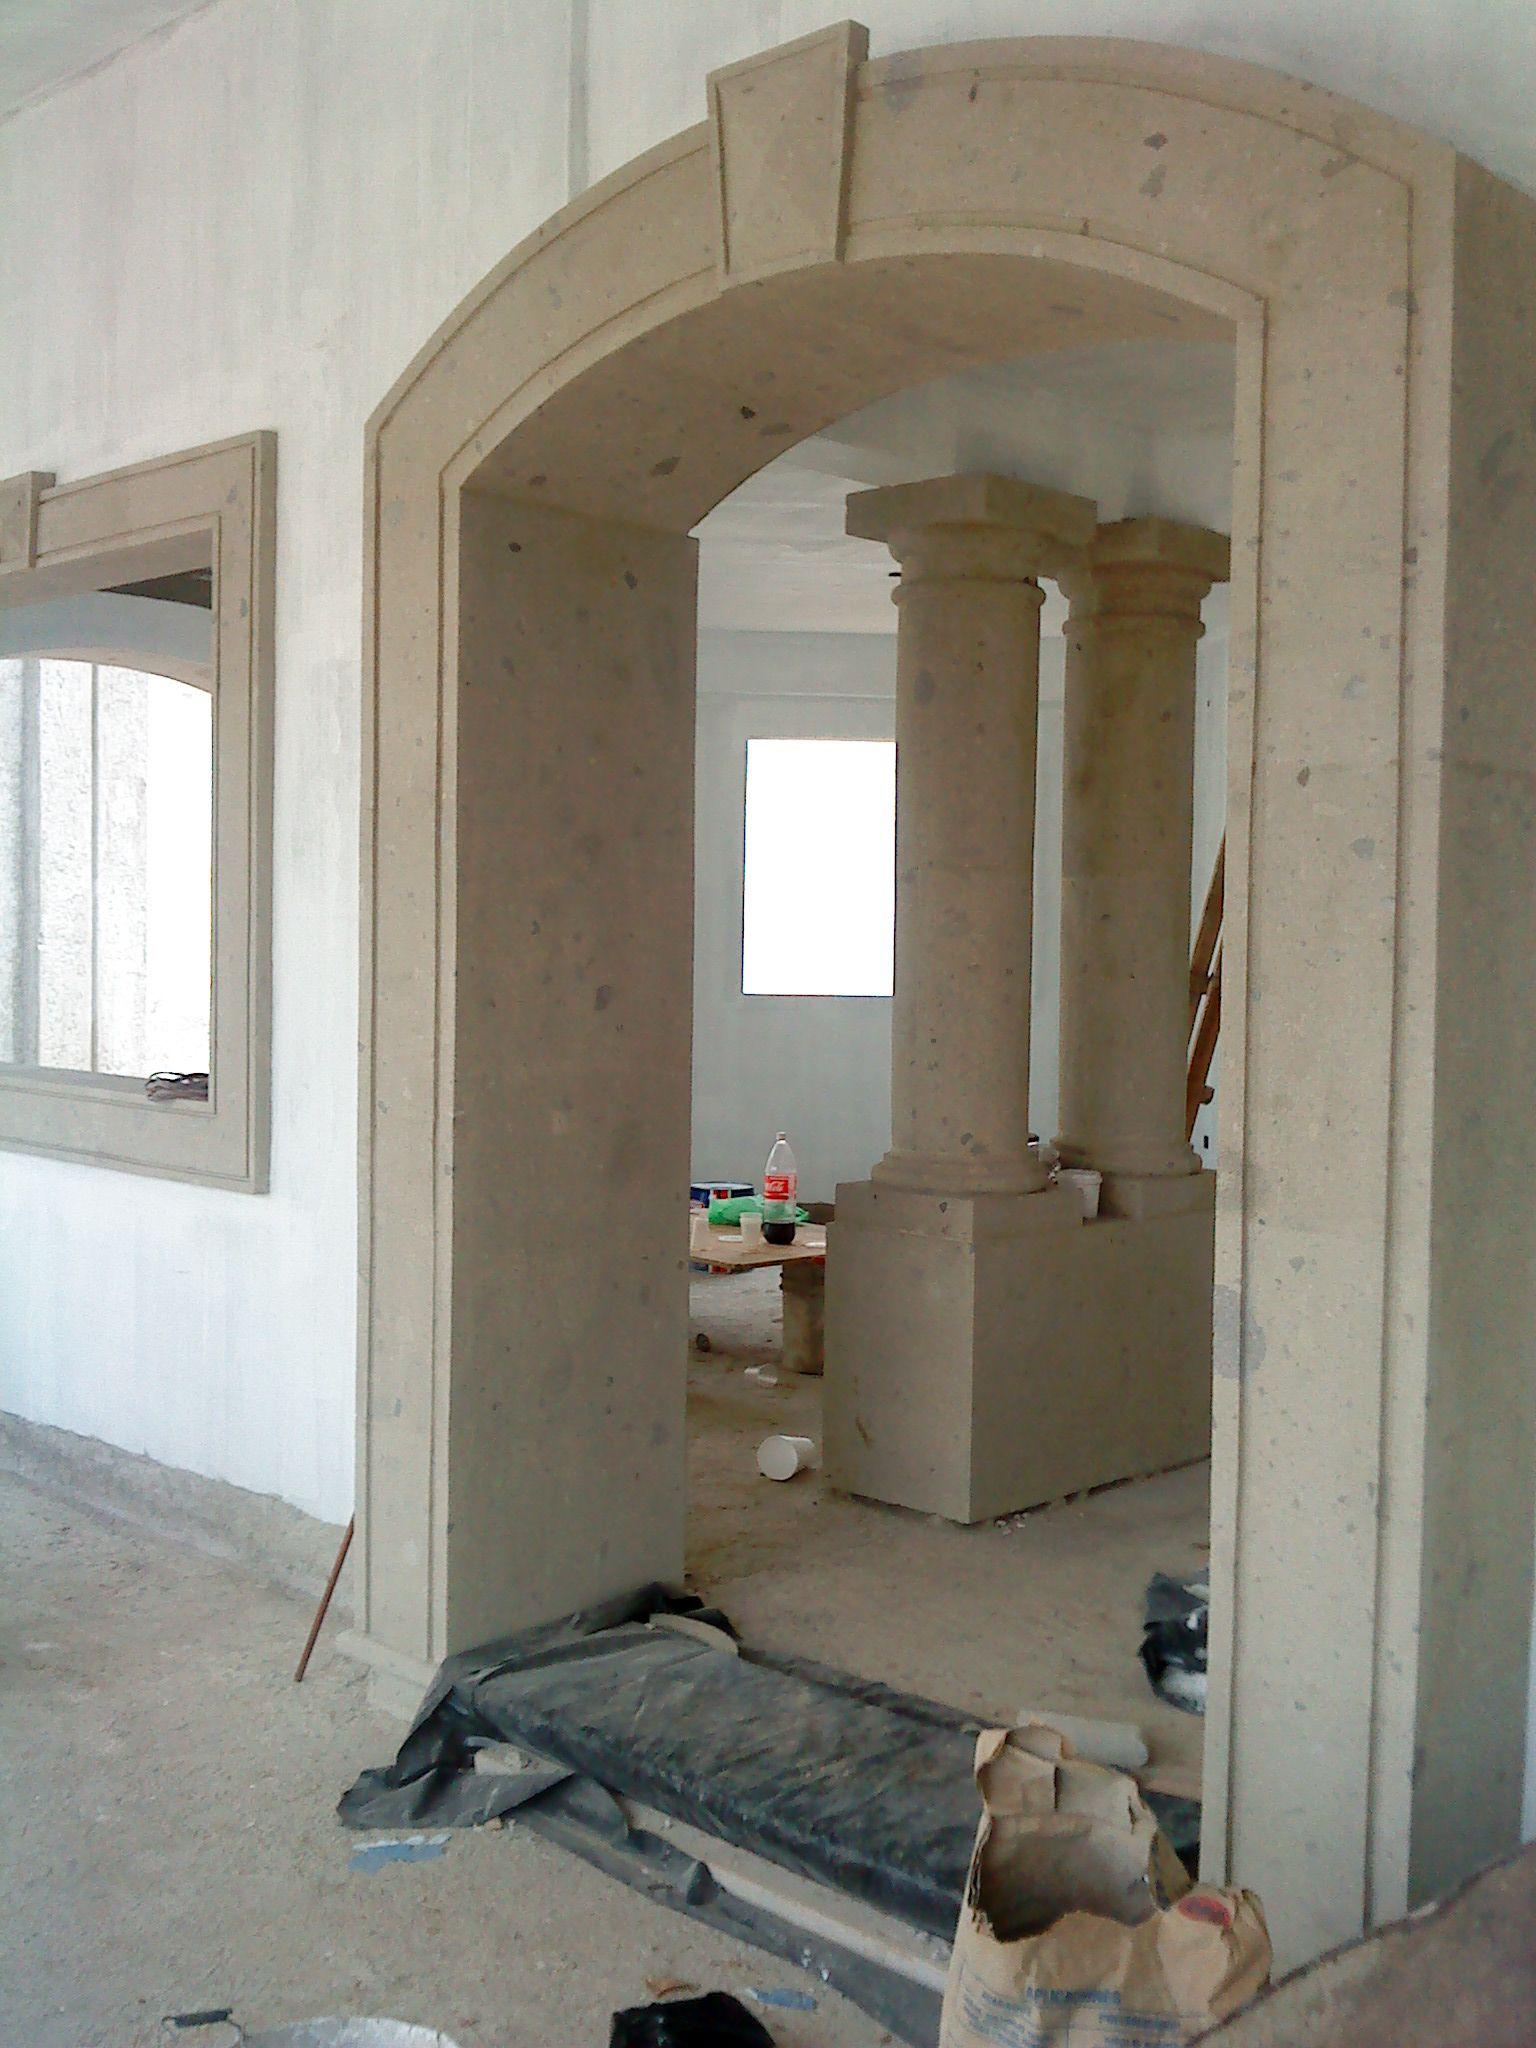 Peque a vivienda estilo tradicional exteriores r sticos e for Decoracion de casas tipo hacienda